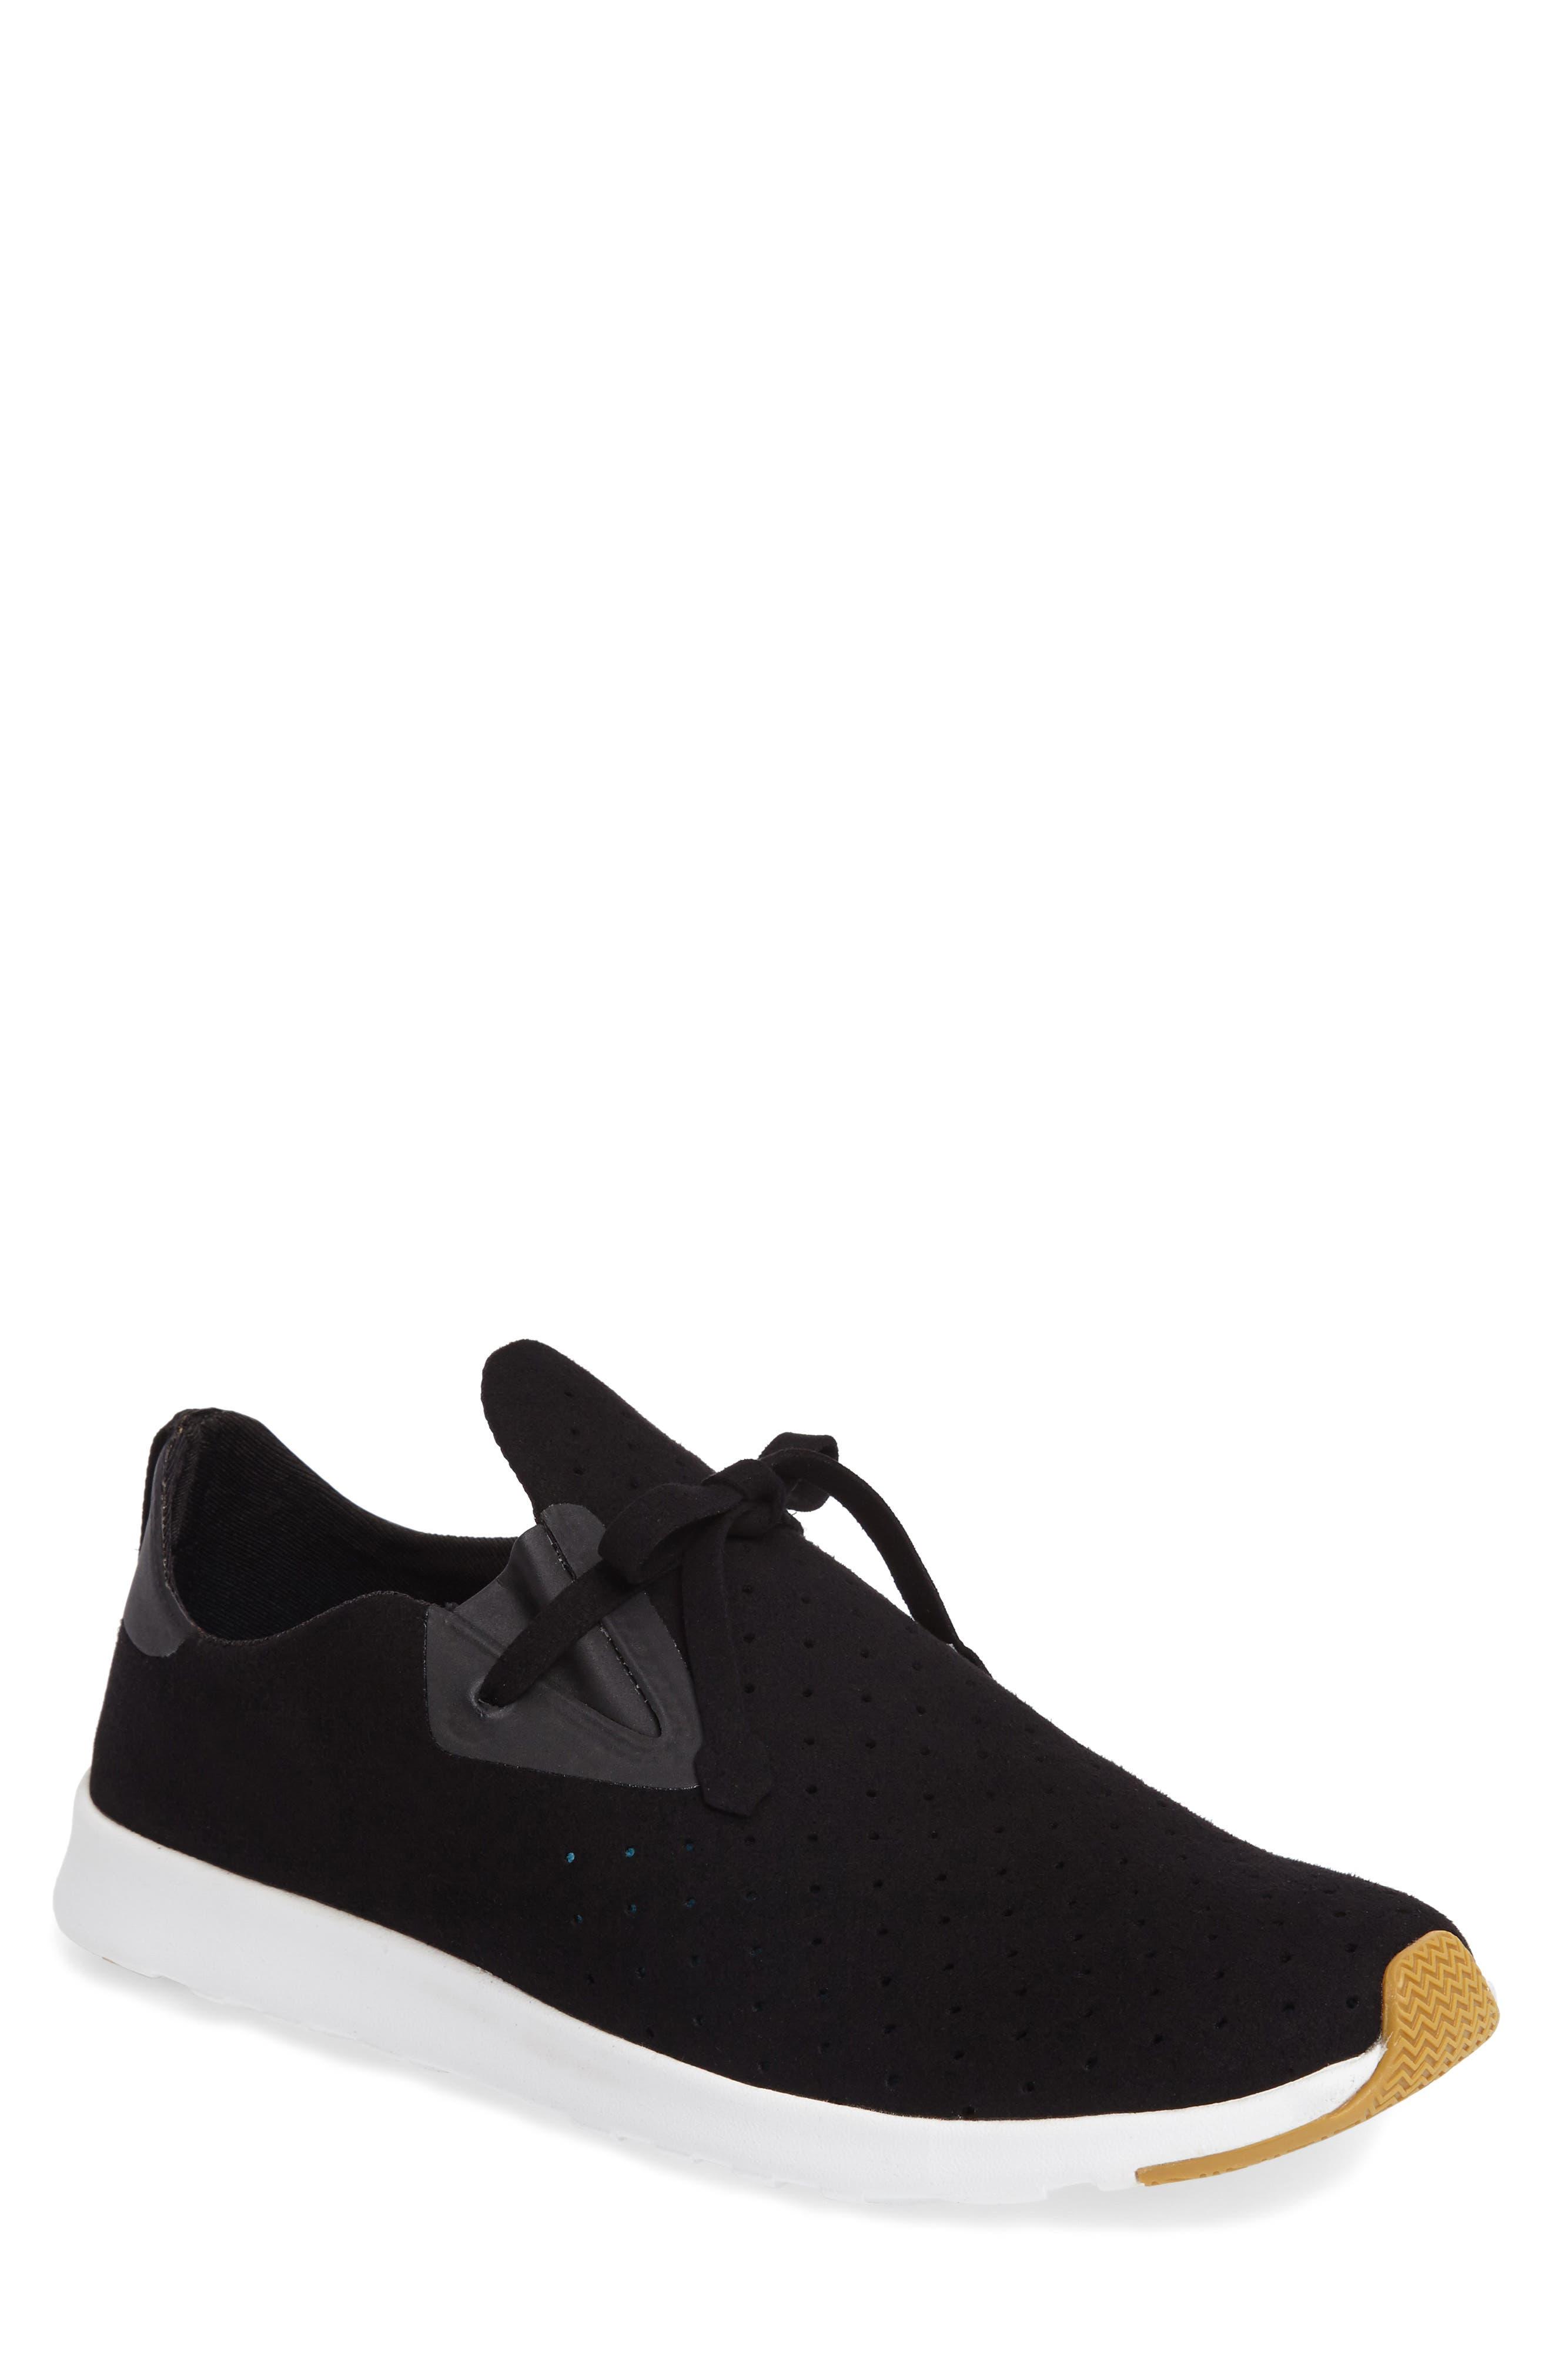 Main Image - Native Shoes 'Apollo' Sneaker (Men)